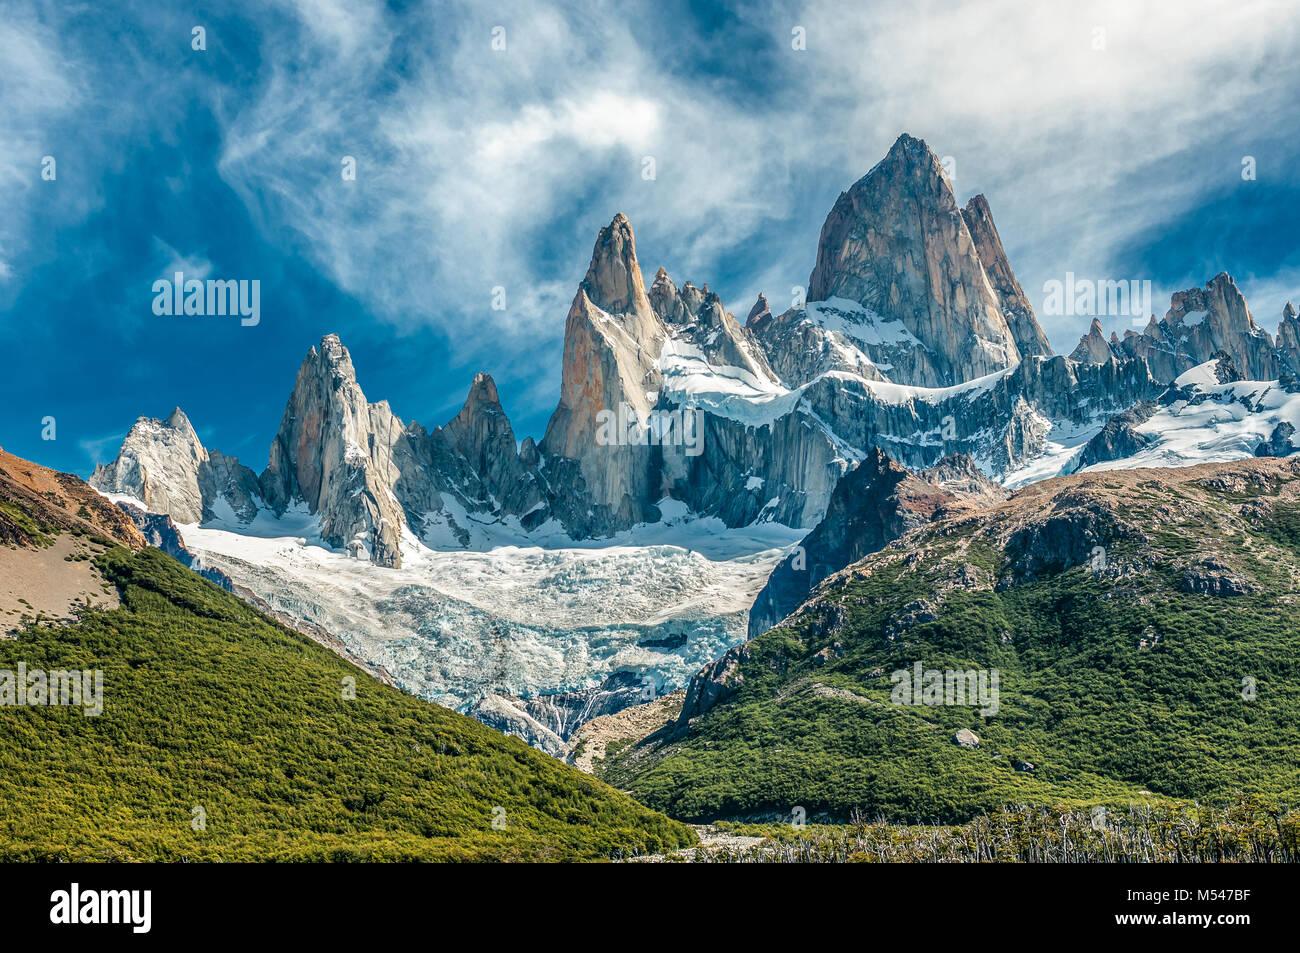 Fitz Roy montagna, El Chalten, Patagonia, Argentina Foto Stock